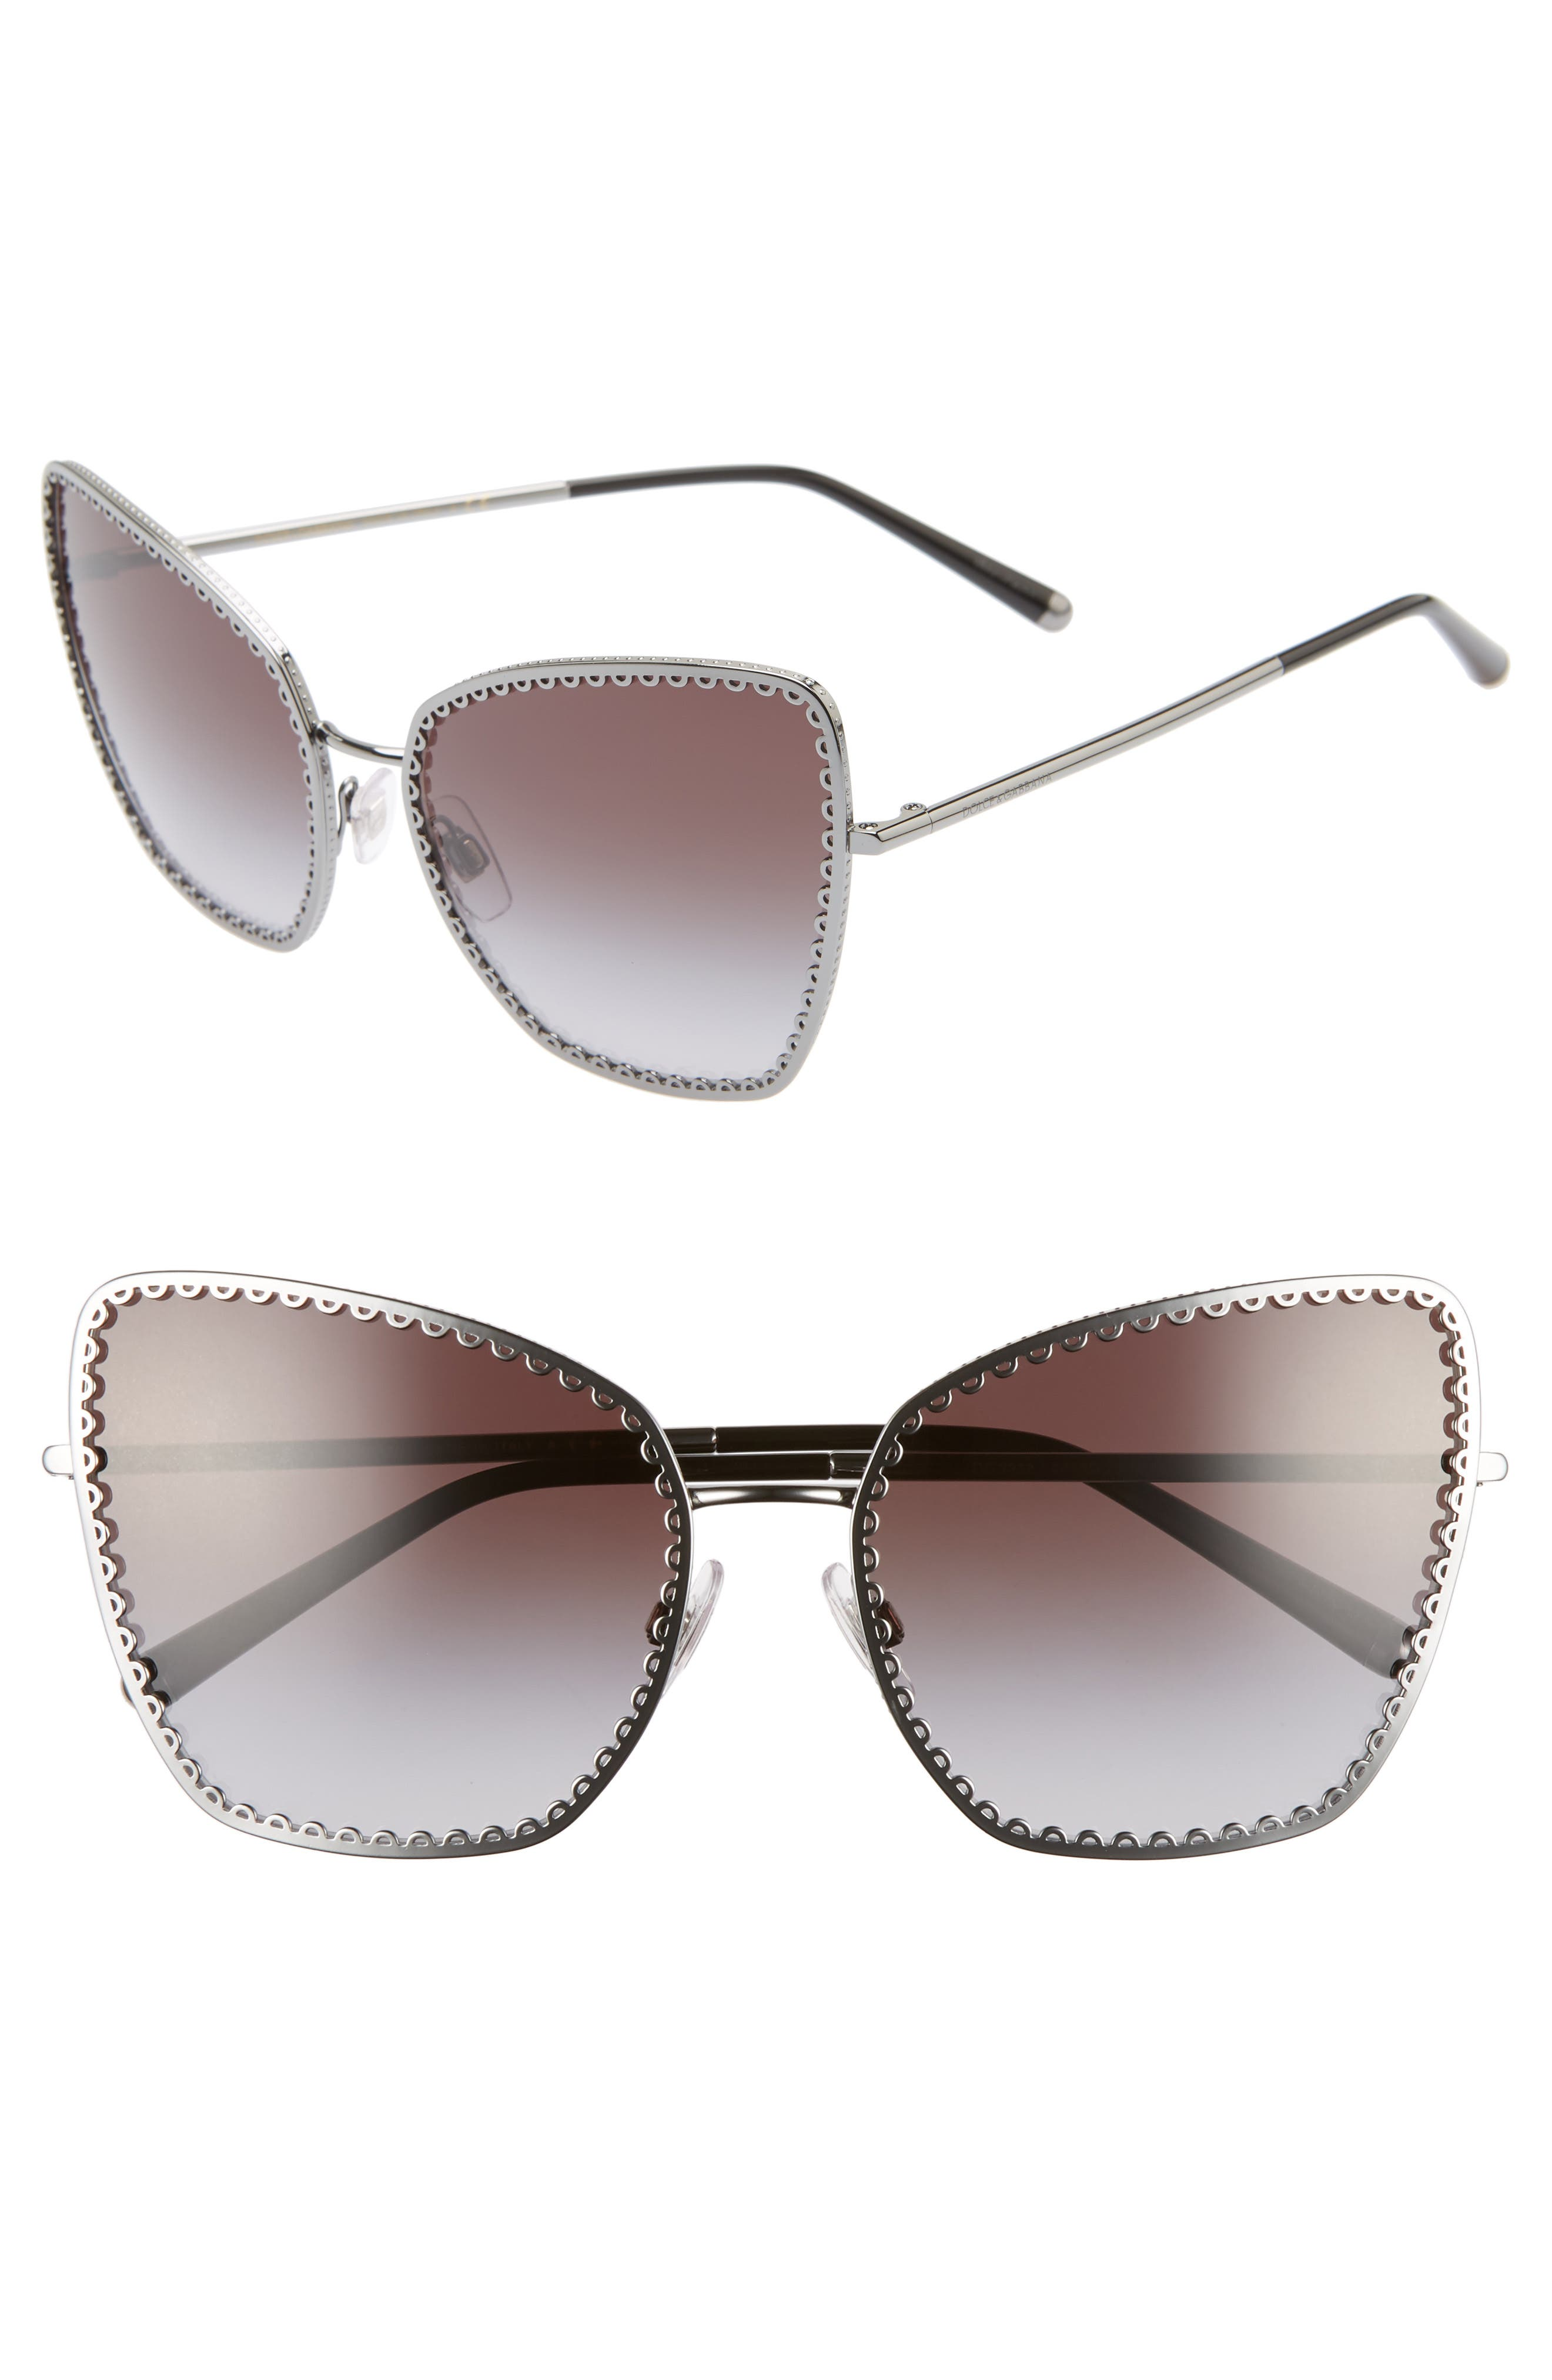 Sacred Heart 61mm Gradient Cat Eye Sunglasses,                         Main,                         color, GUNMETAL GRADIENT